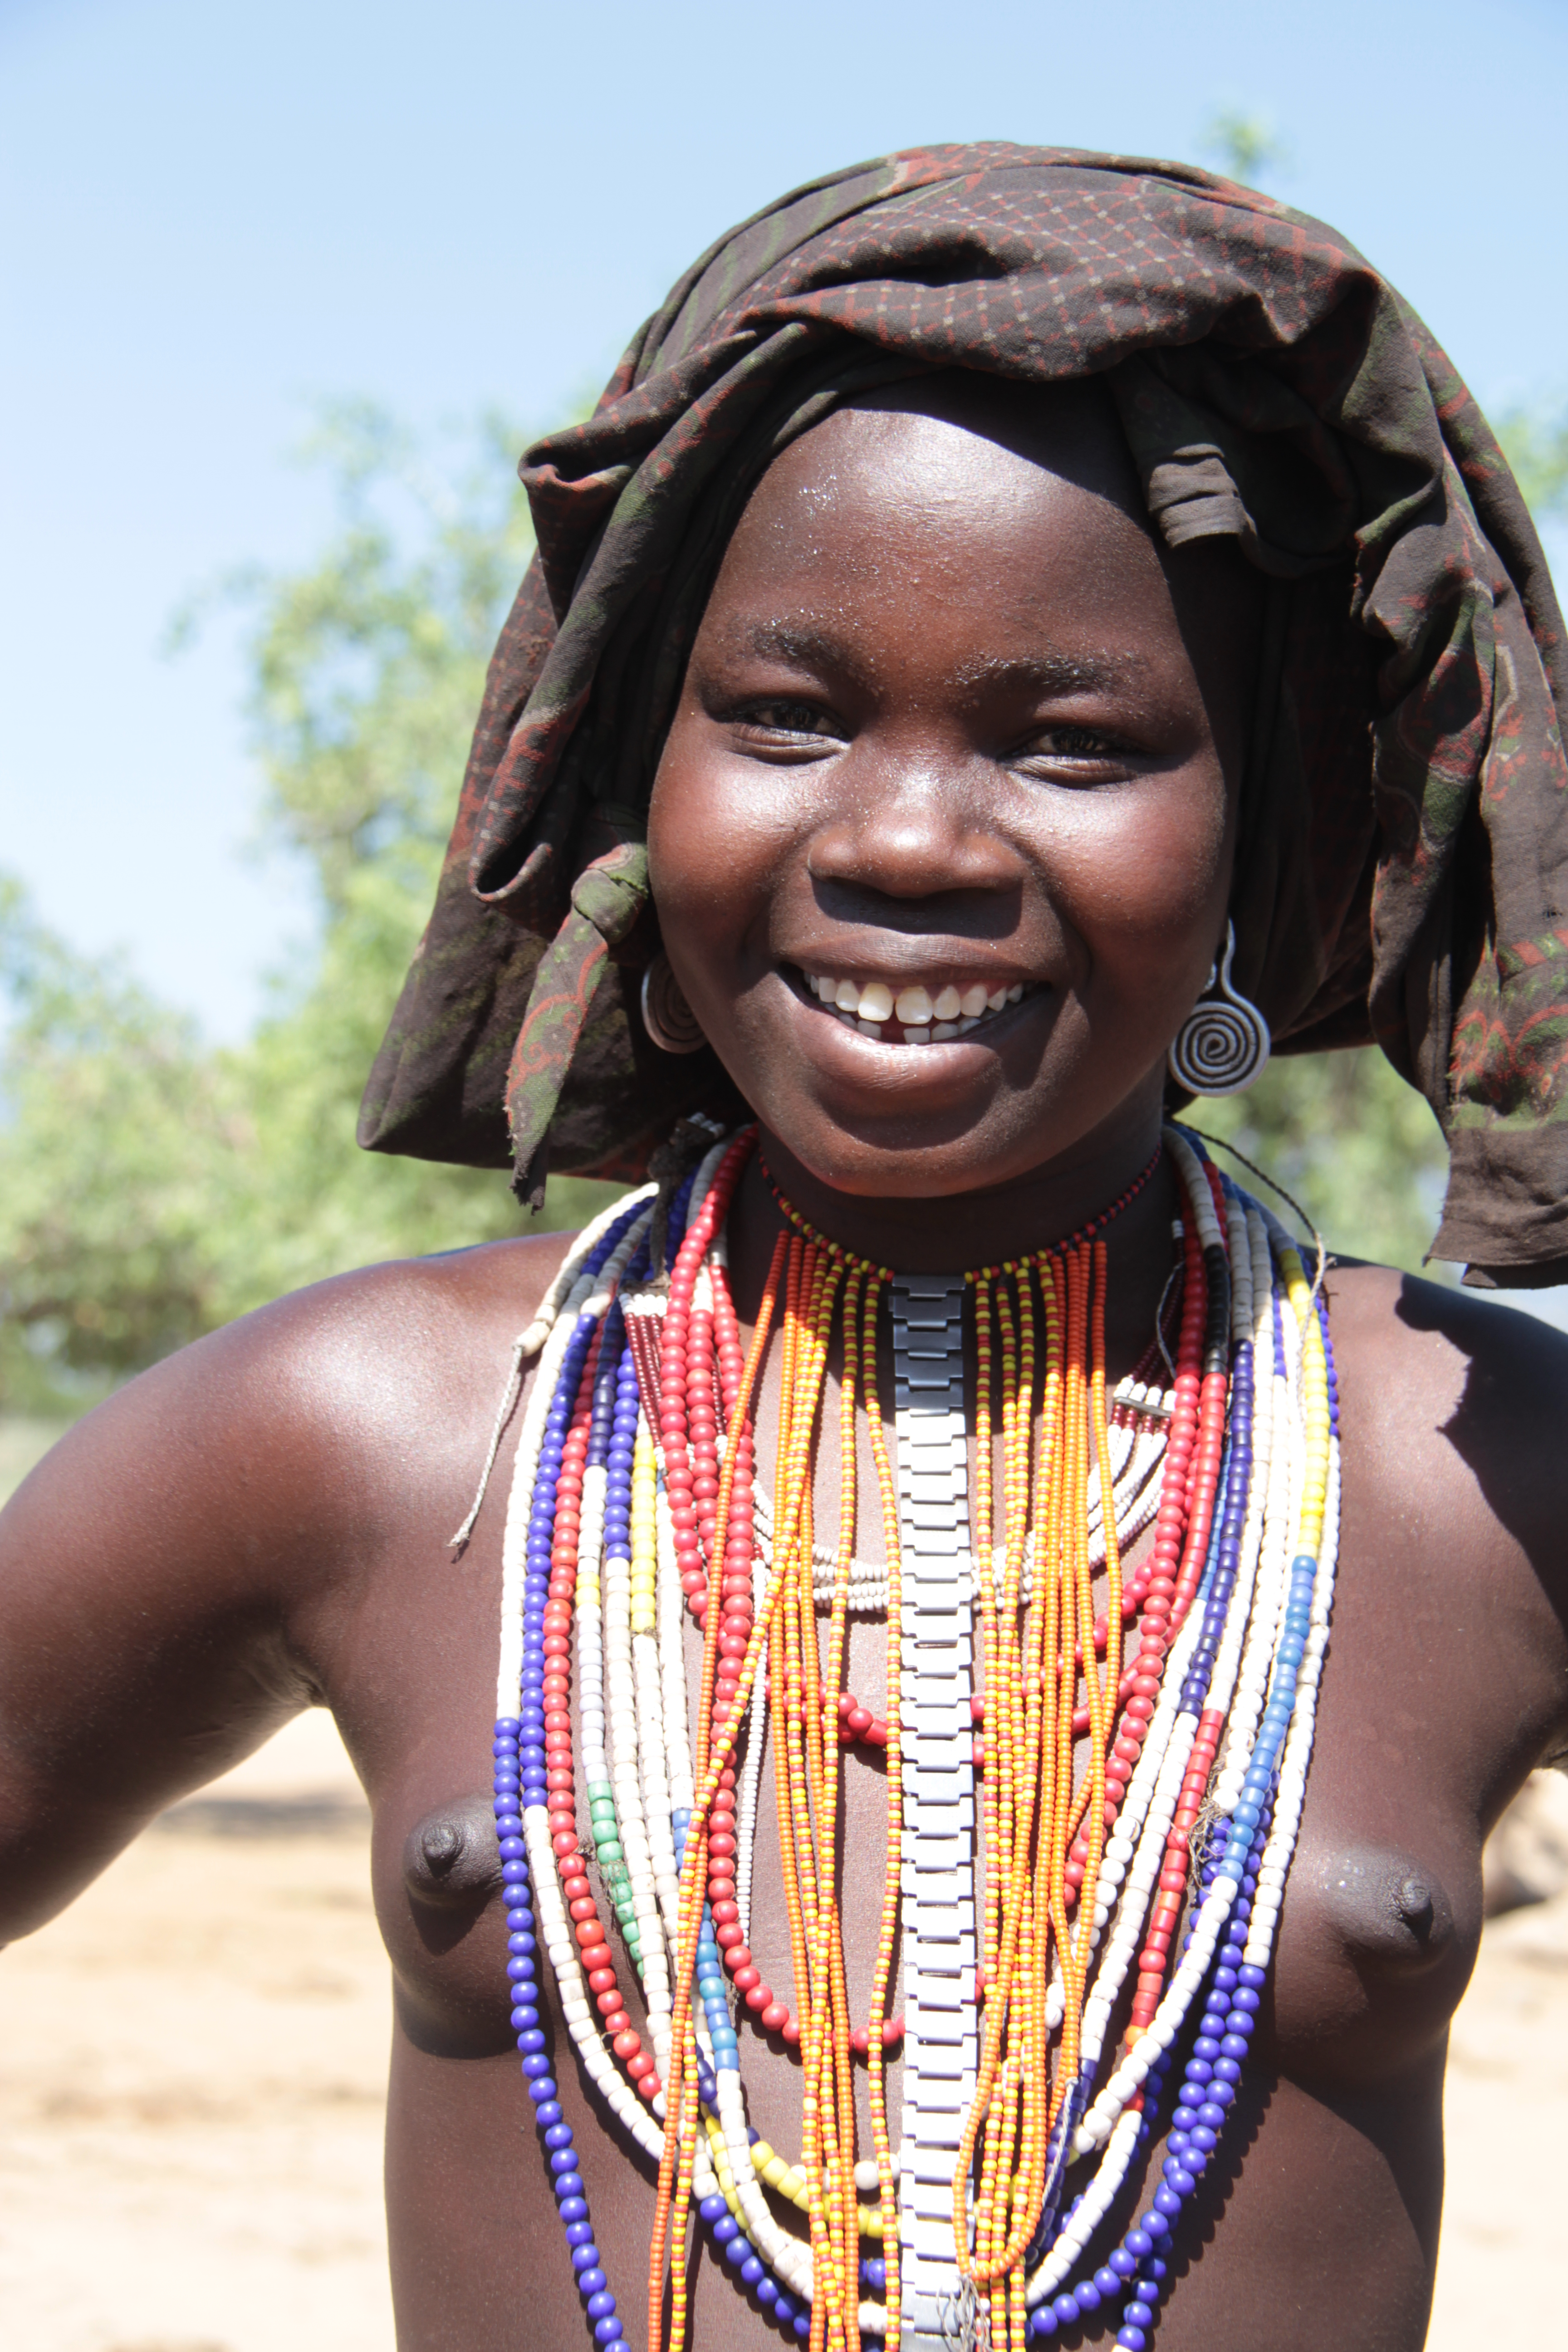 File:3844 Ethiopie ethnie Arbore.JPG - Wikimedia Commons